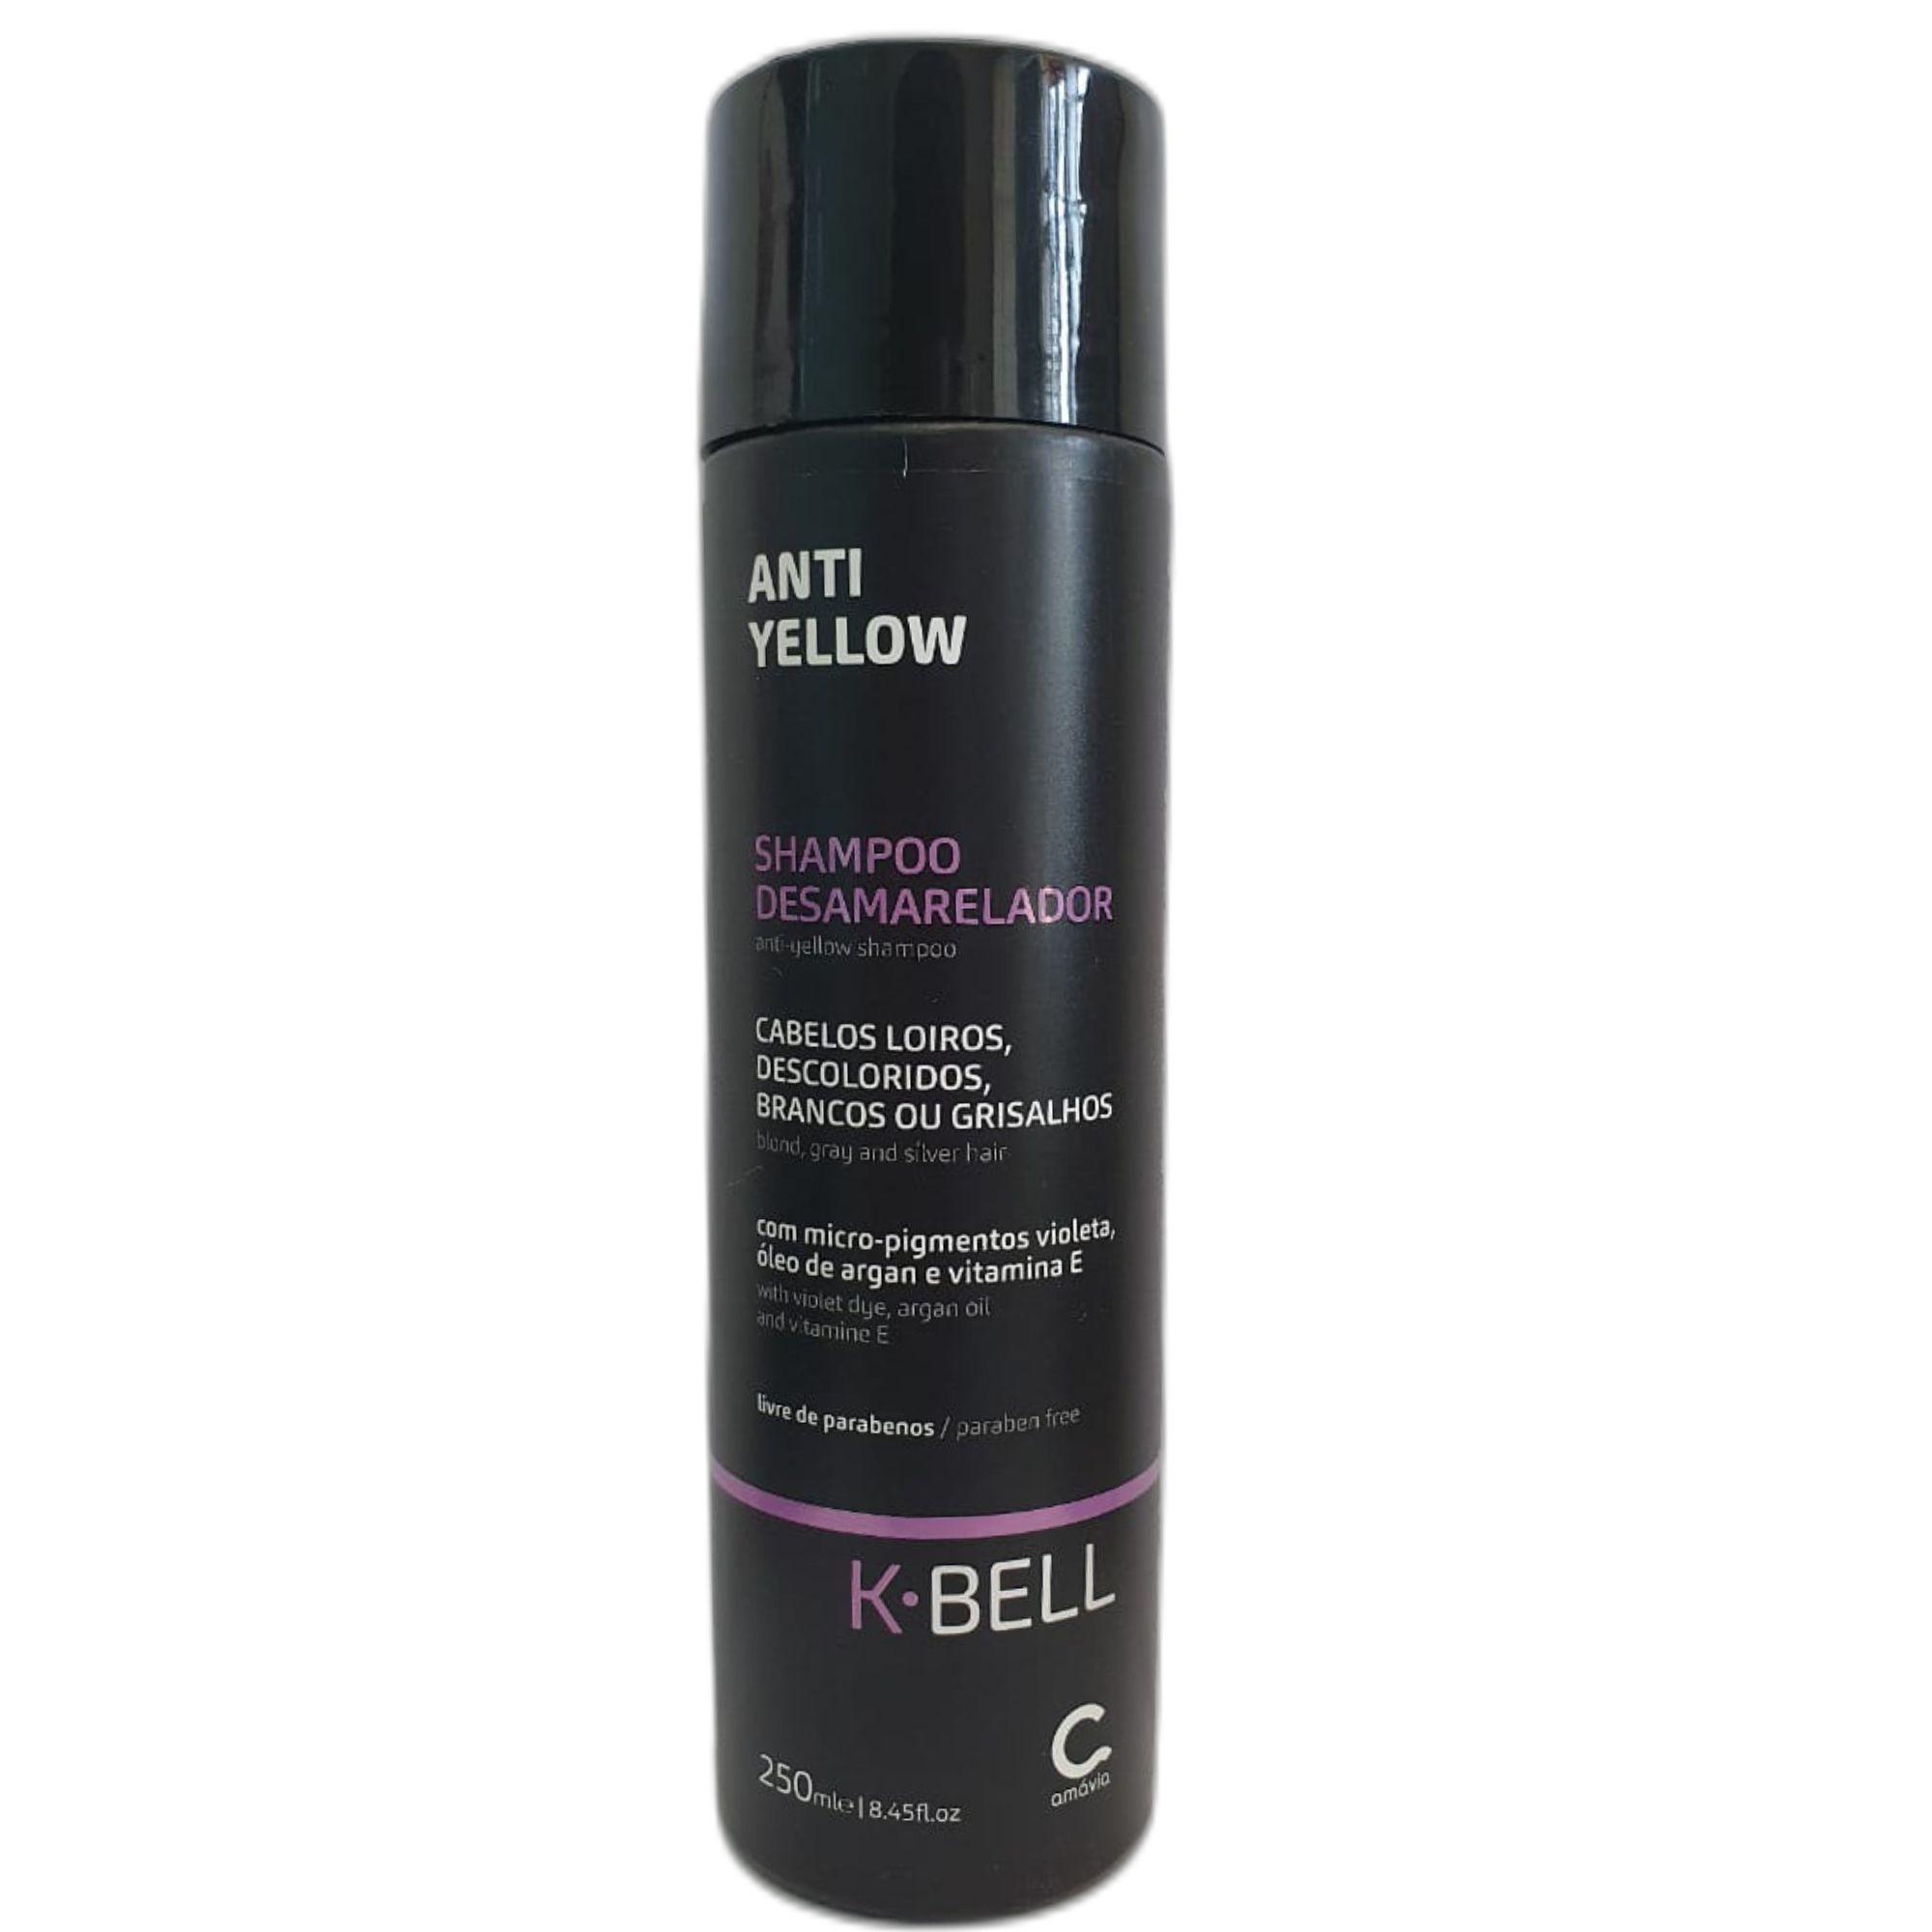 KBELL - Anti Yellow Shampoo Desamarelador 250ml